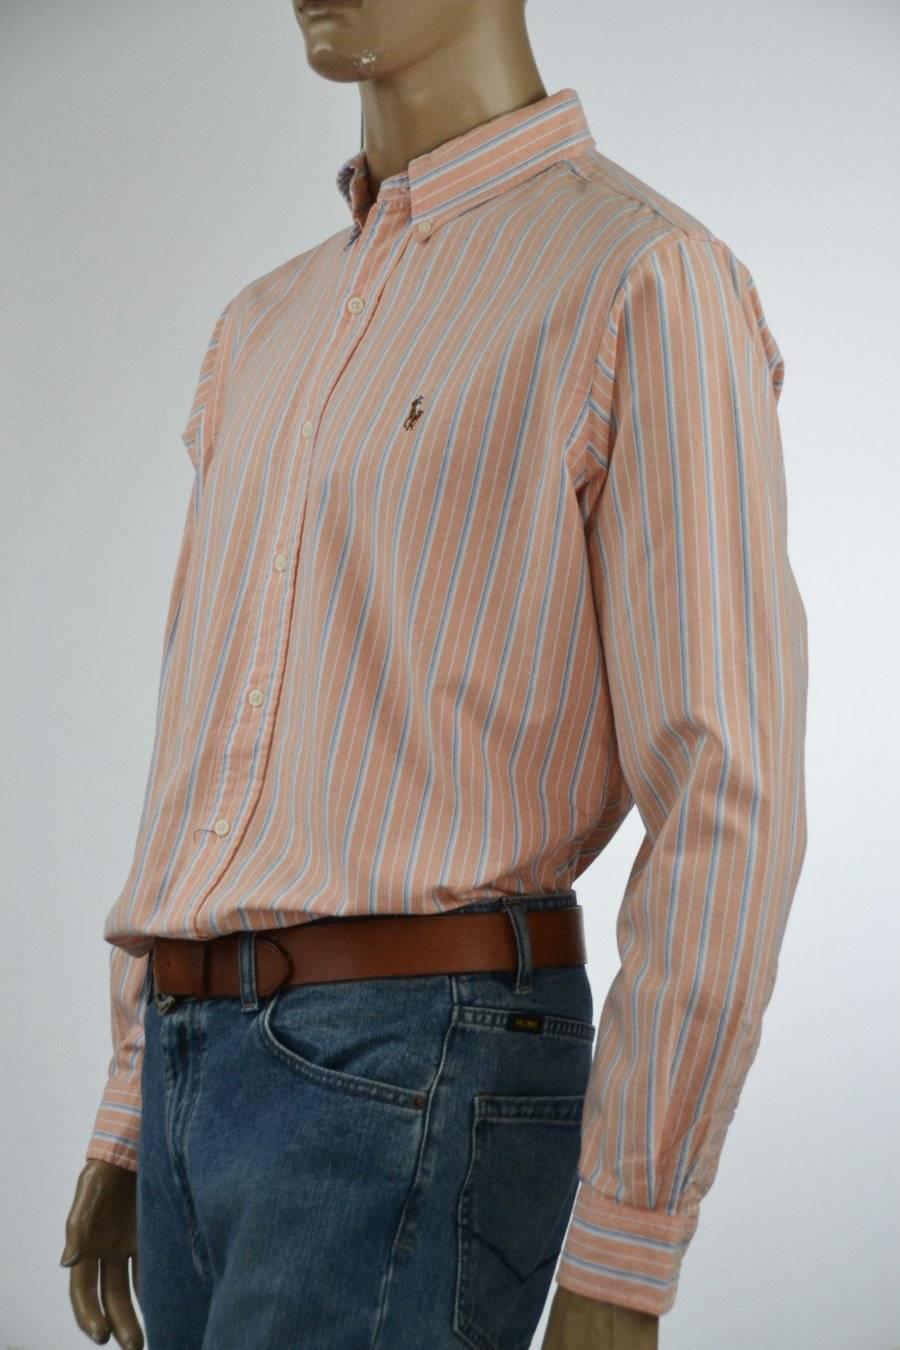 Ralph Lauren Classic Fit Oxford Cotton Peach Stripe Stripe Peach Long Sleeve Shirt/ -Large 1d6d12